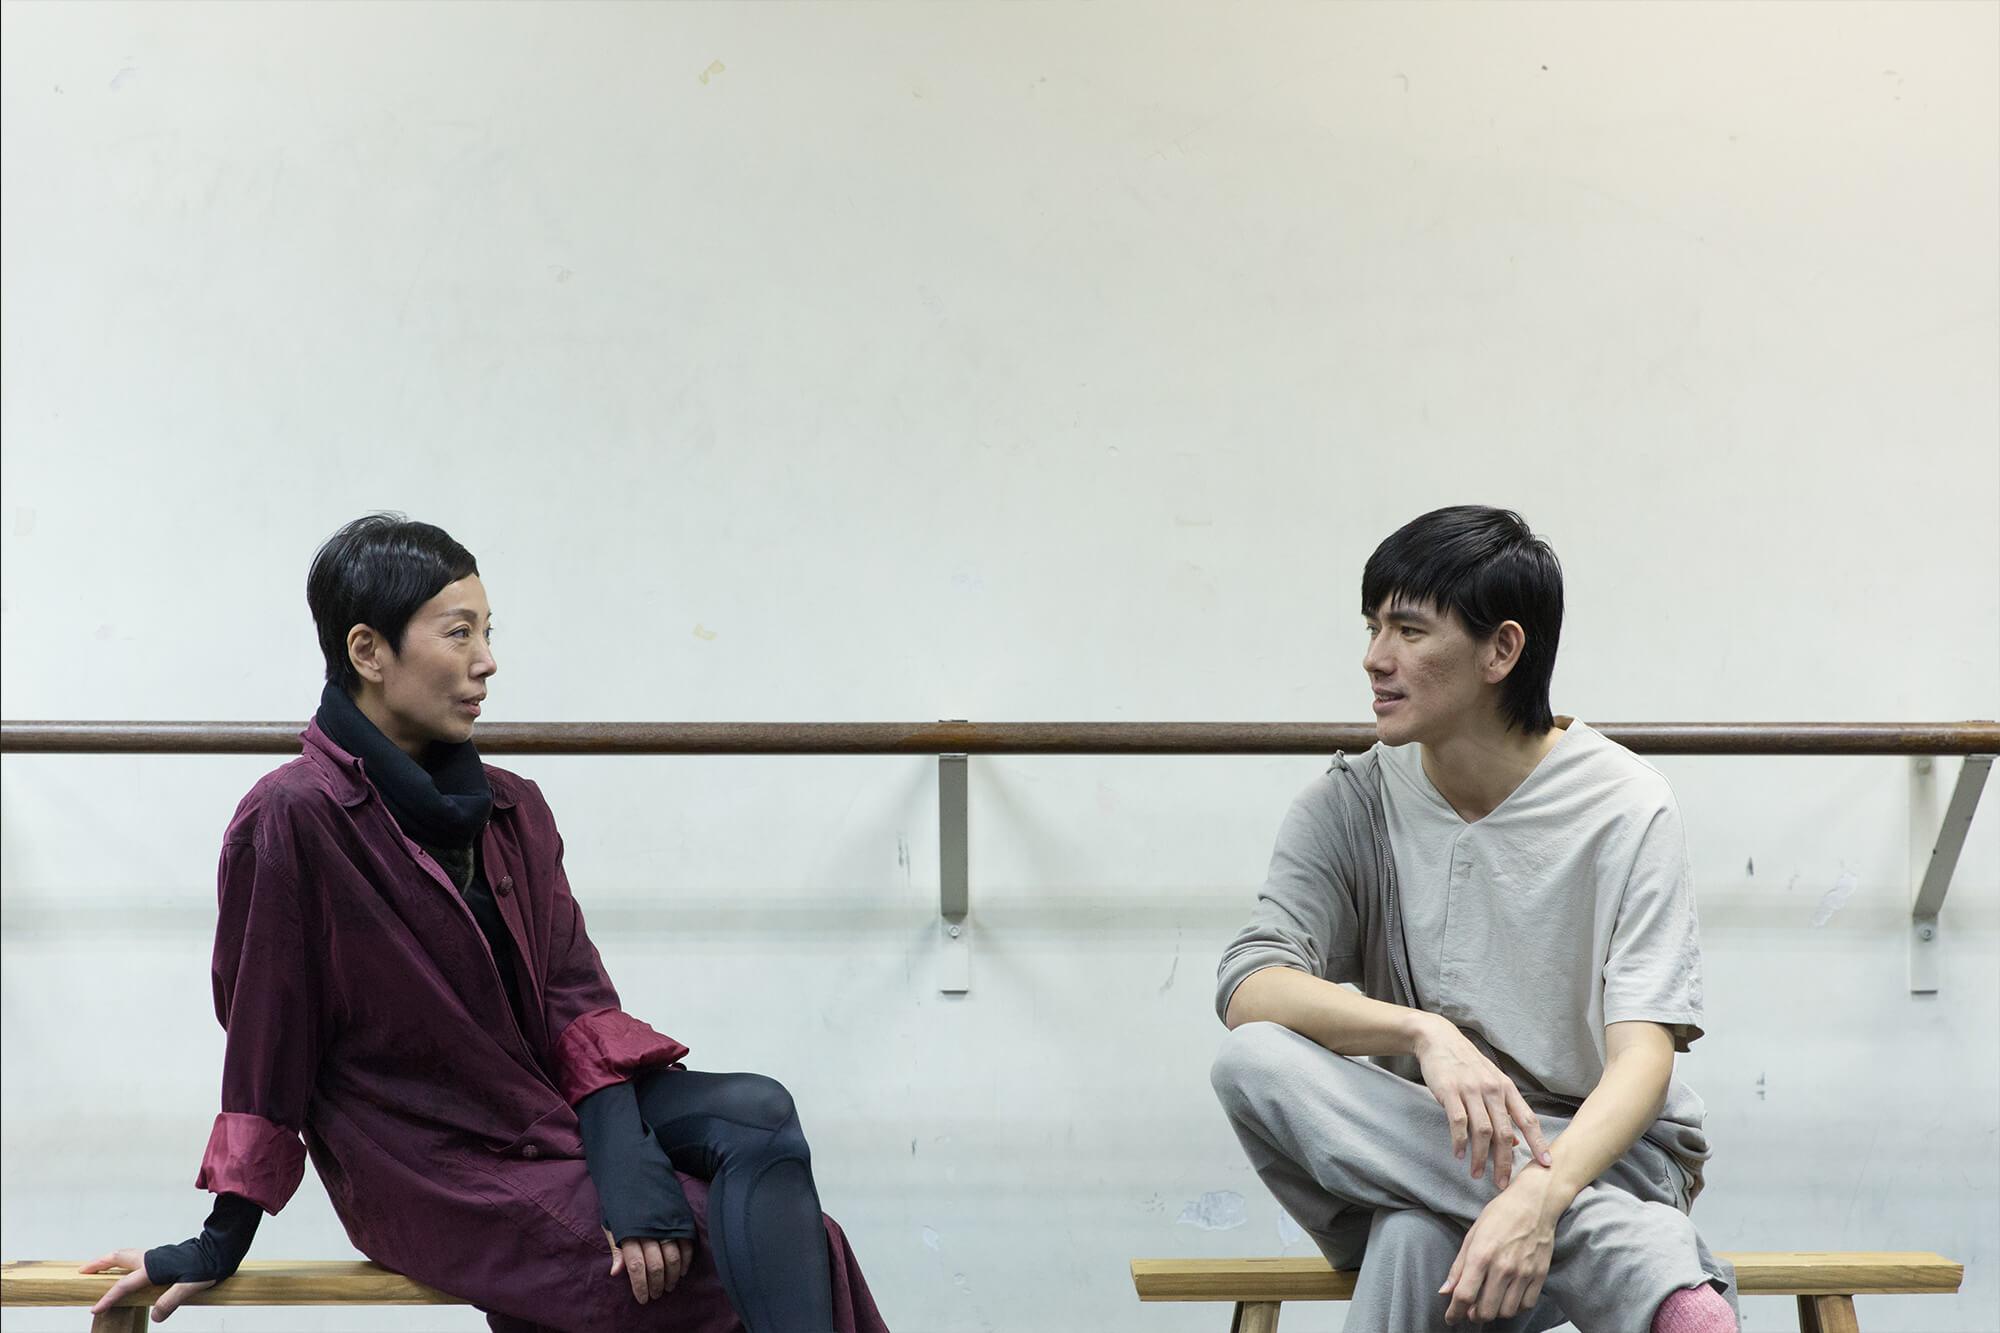 CCDC平常的舞作只有二至三個月的製作期,但喬楊(左)跟周書毅(右)的首次合作,破天荒花了超過一年的時間創作。